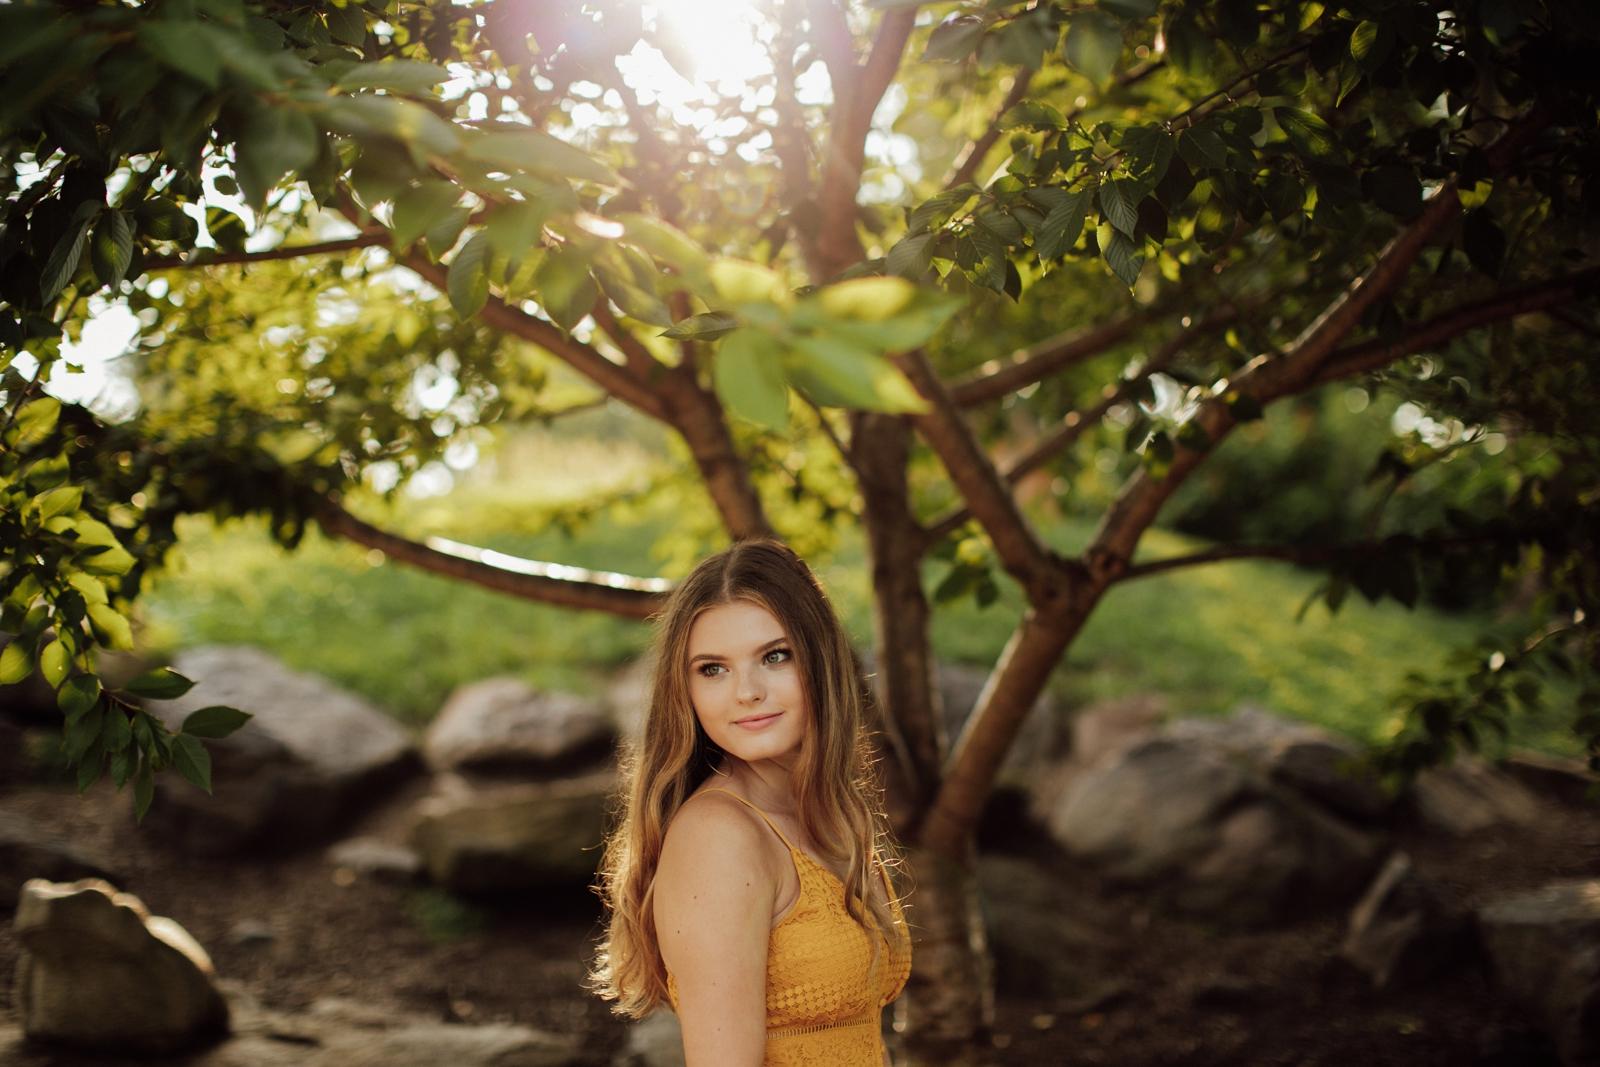 High School Senior Portraits Photographer Pittsburgh Mellon Park